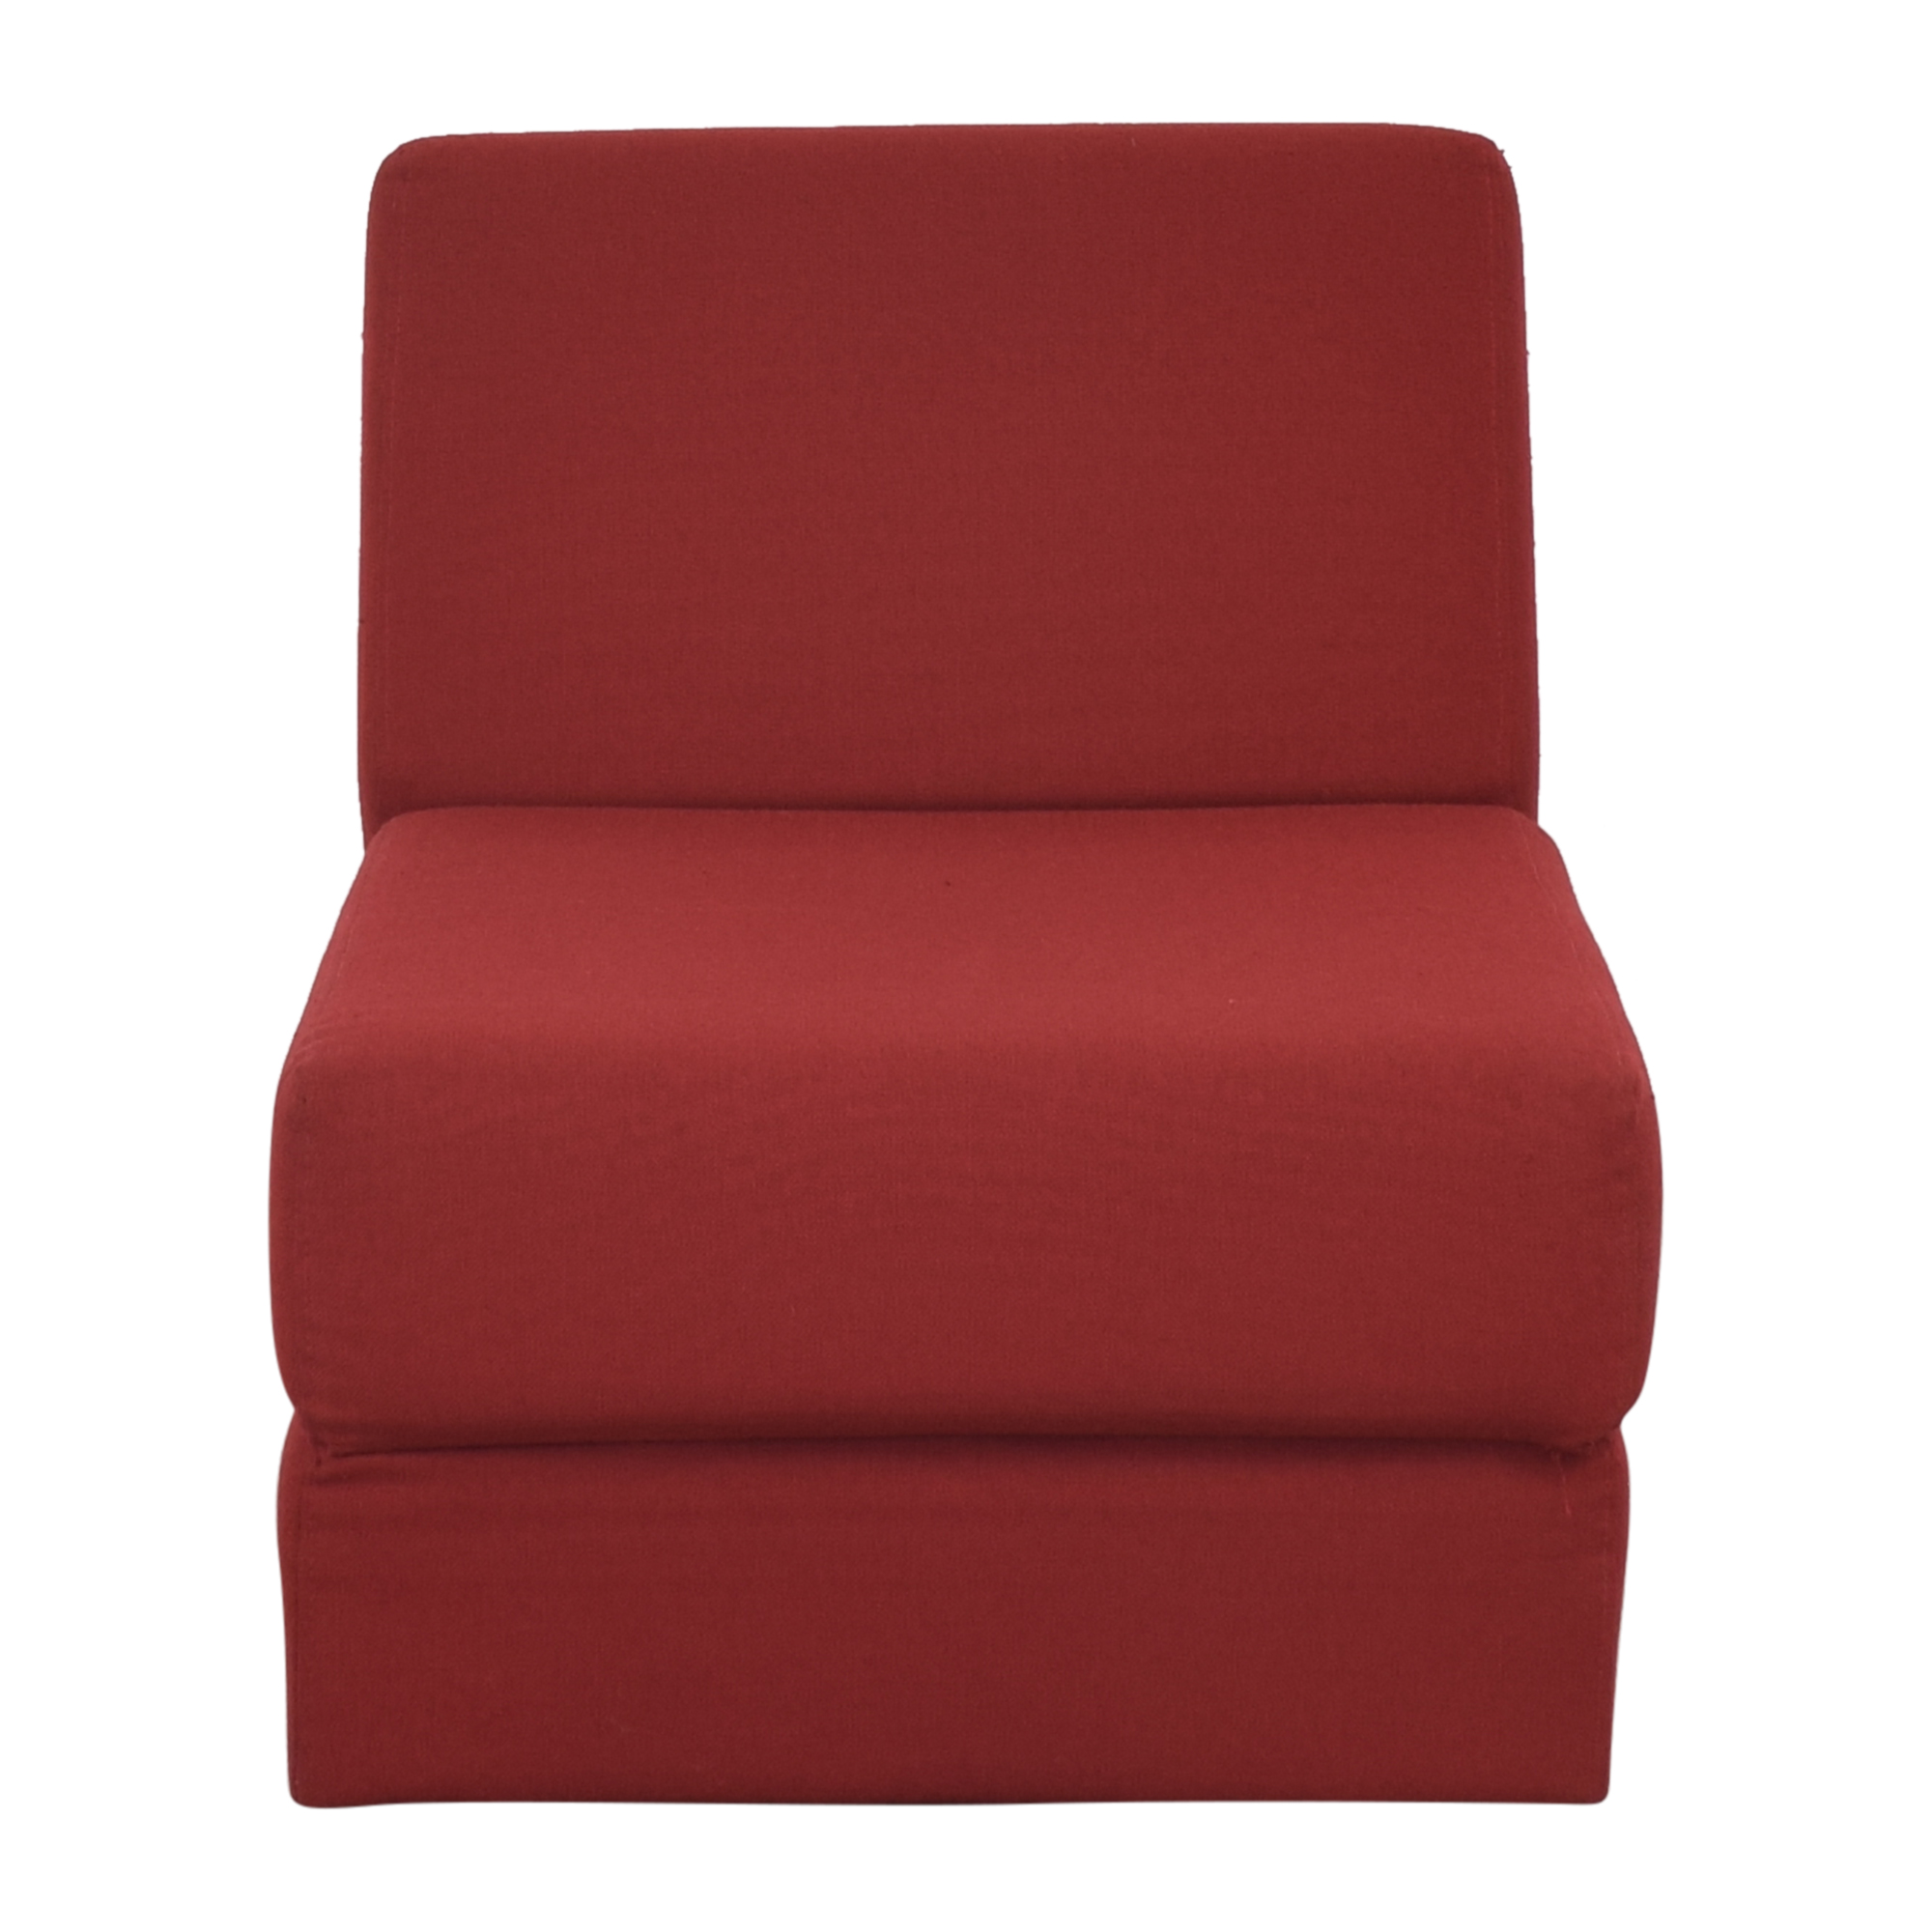 Lazzoni Lazzoni Mini Seat Packing Sofa Bed